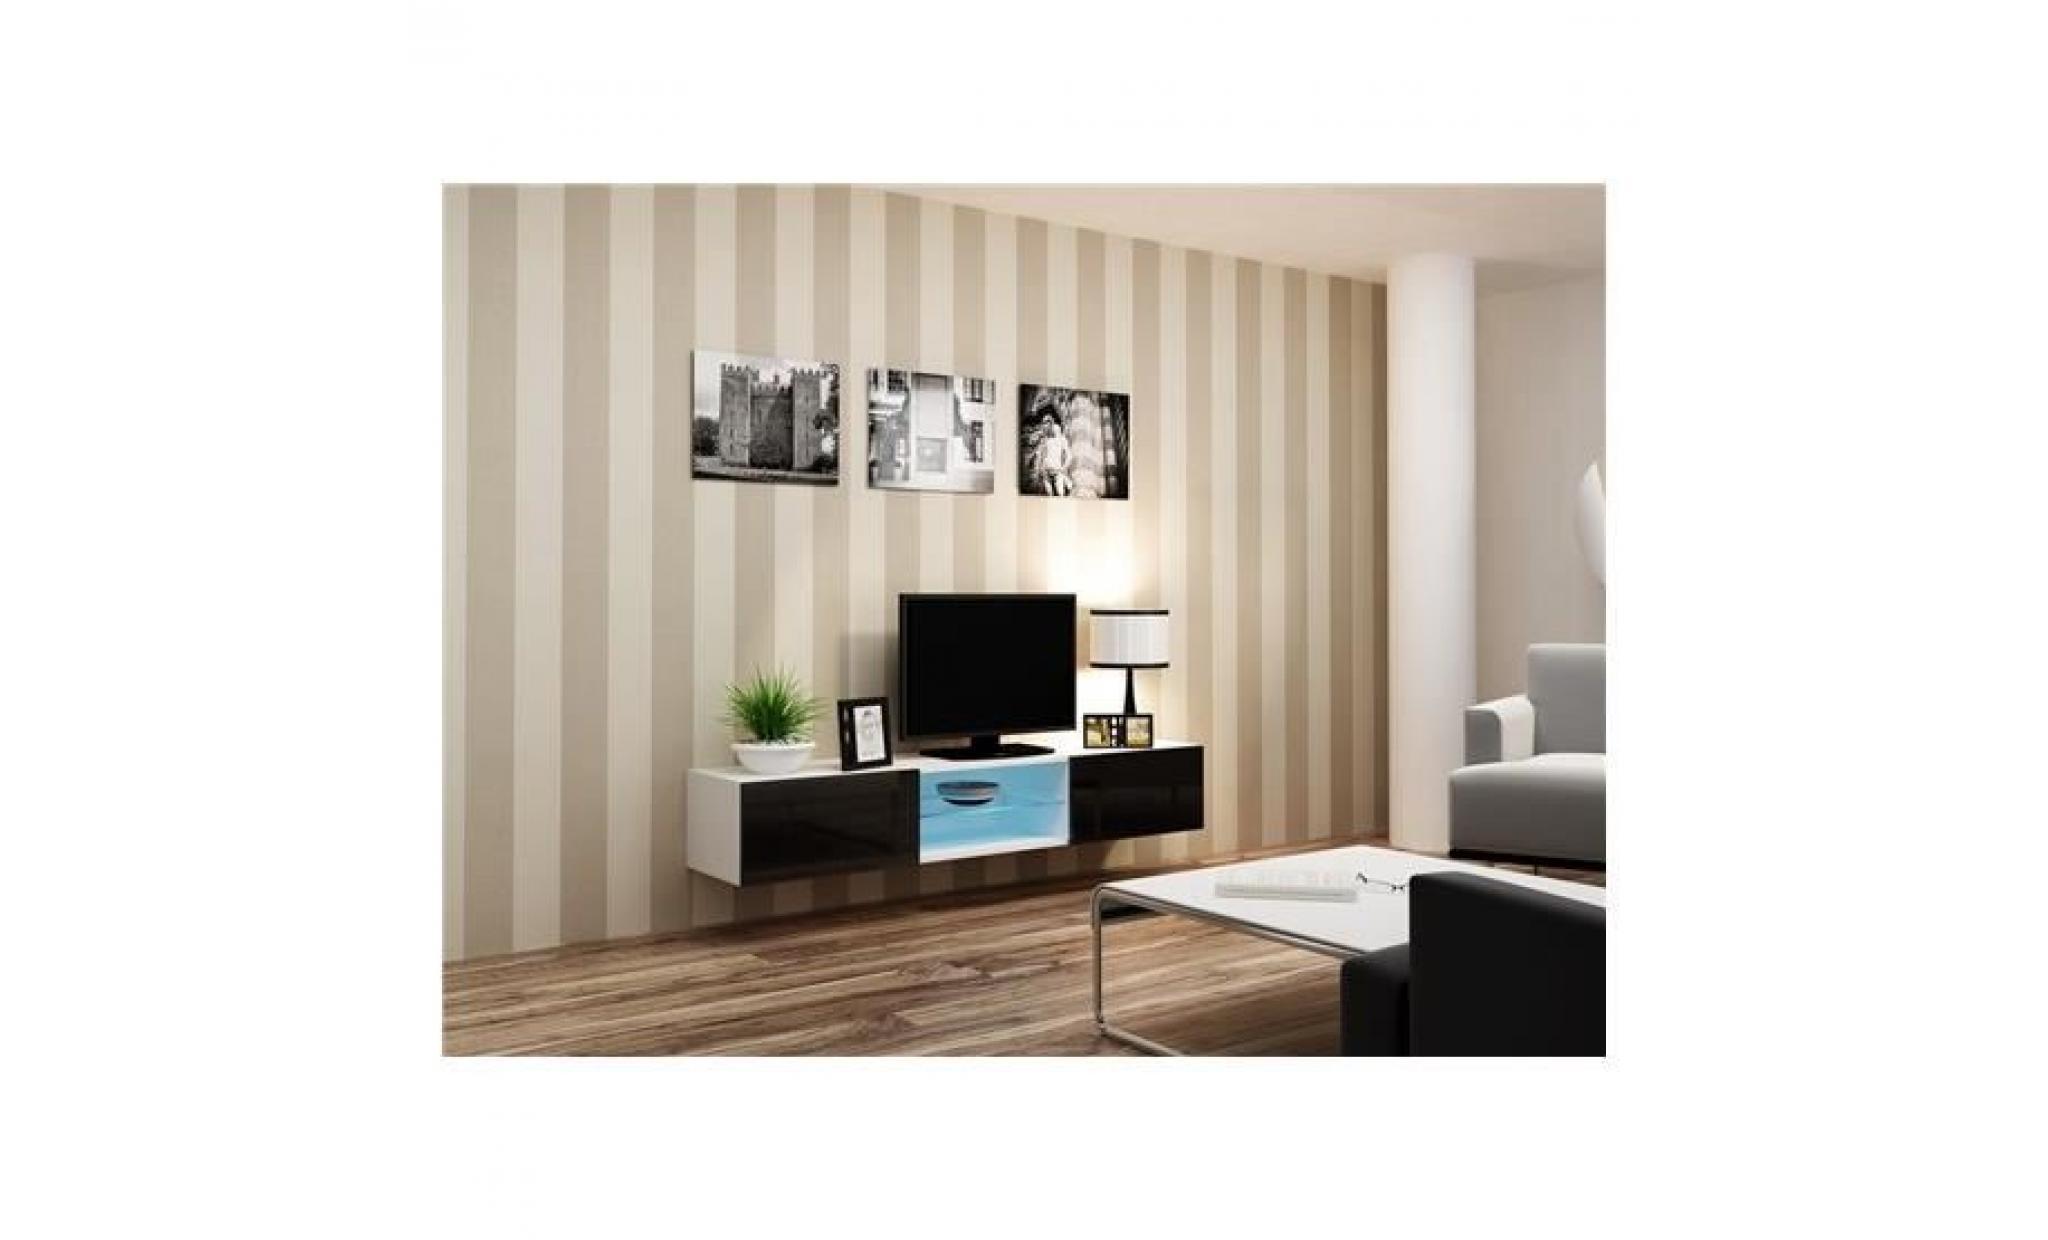 acheter meuble tv design pas cher. Black Bedroom Furniture Sets. Home Design Ideas